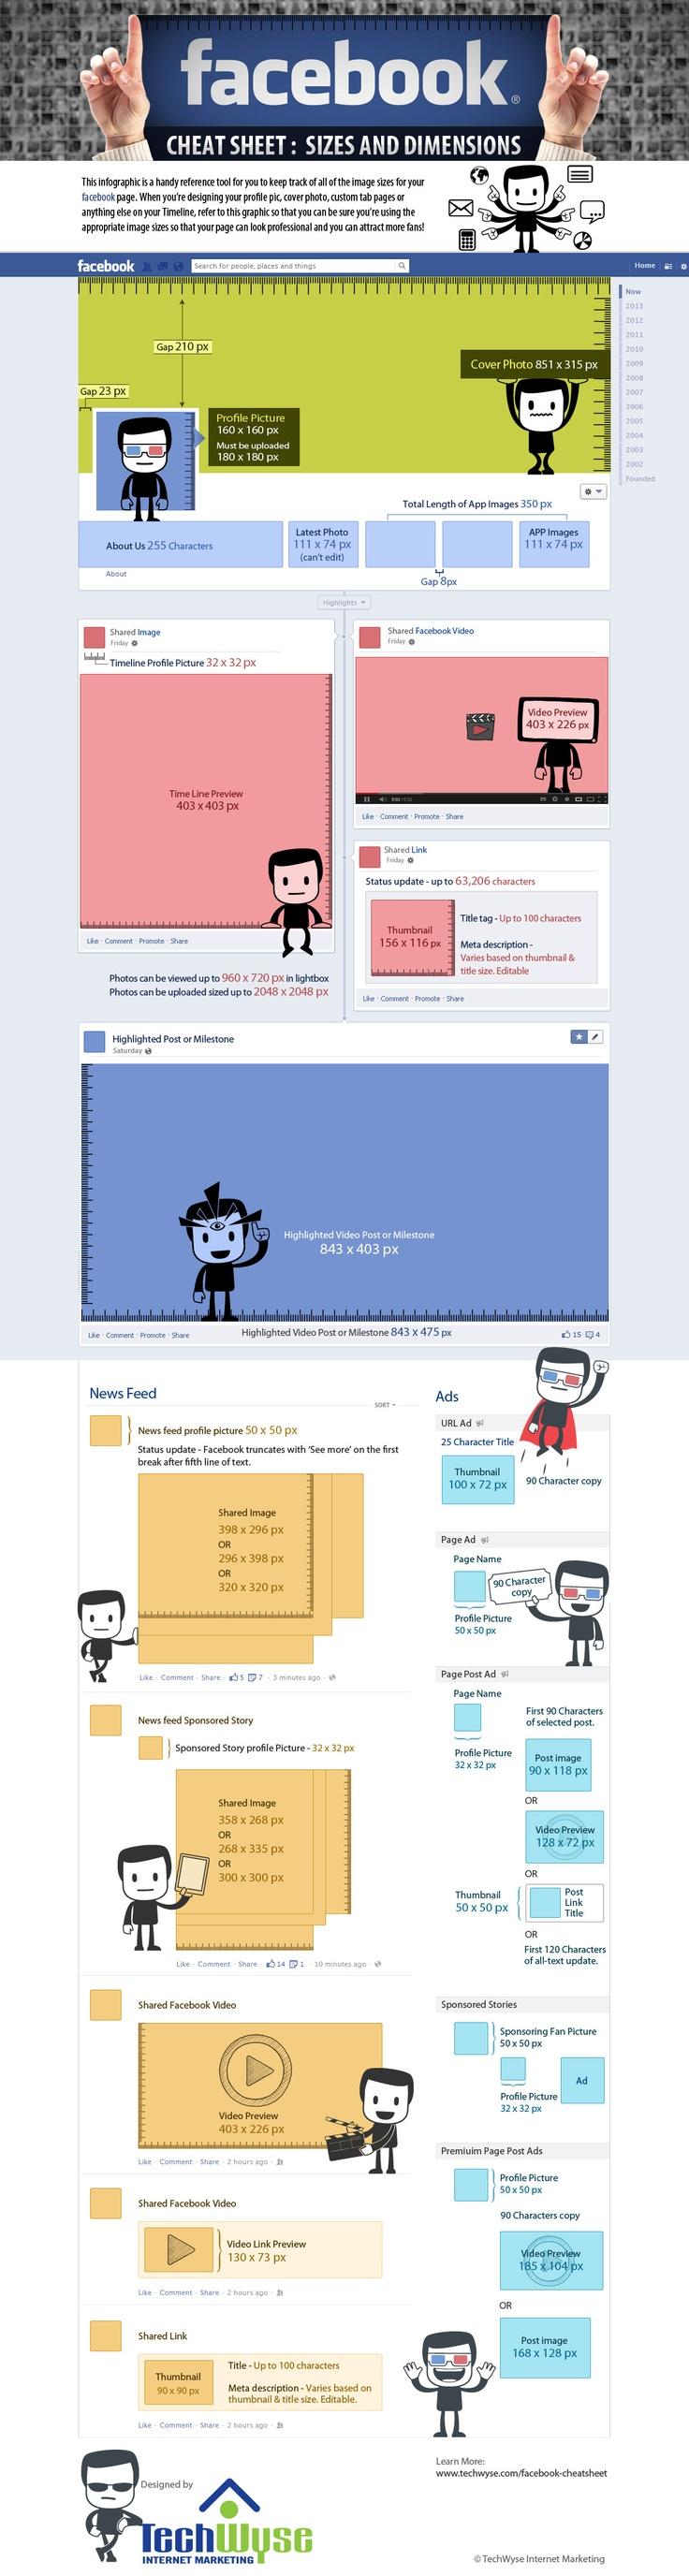 Facebook_medidas